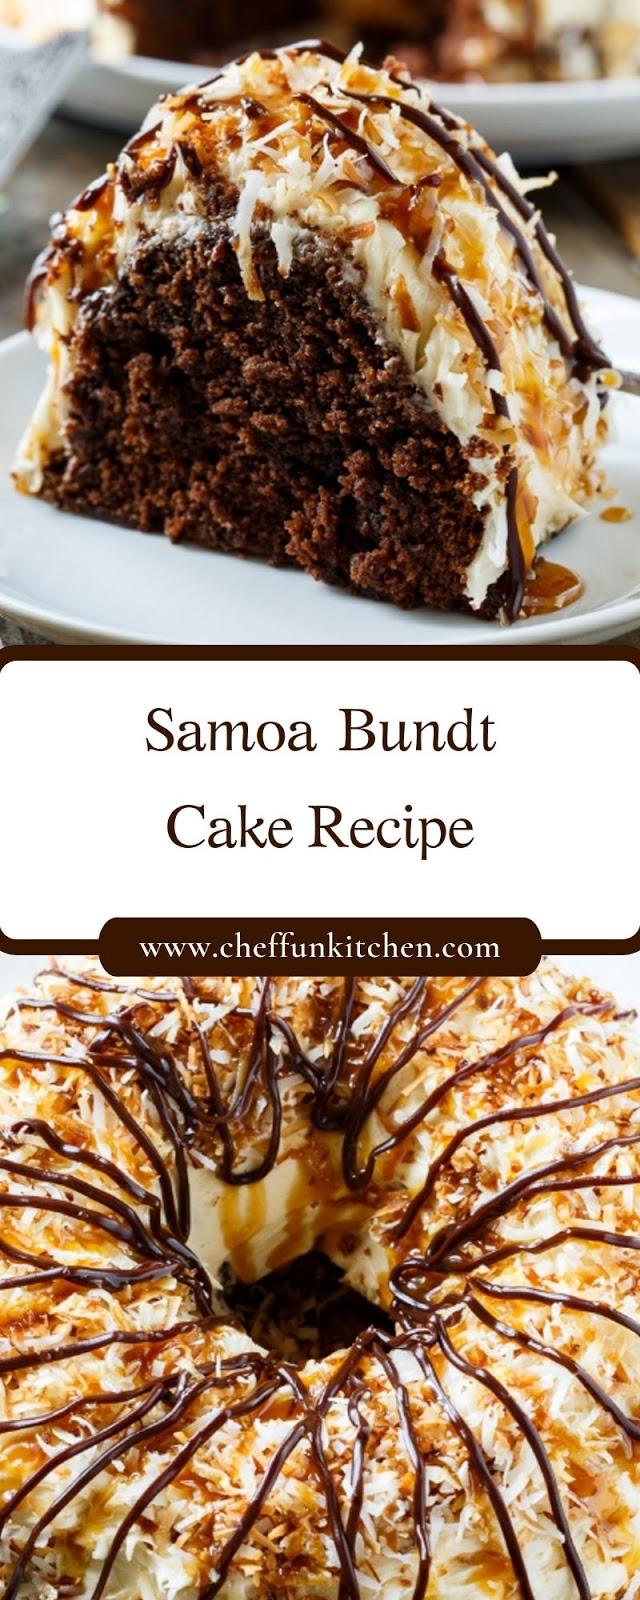 Samoa Bundt CakeRecipe